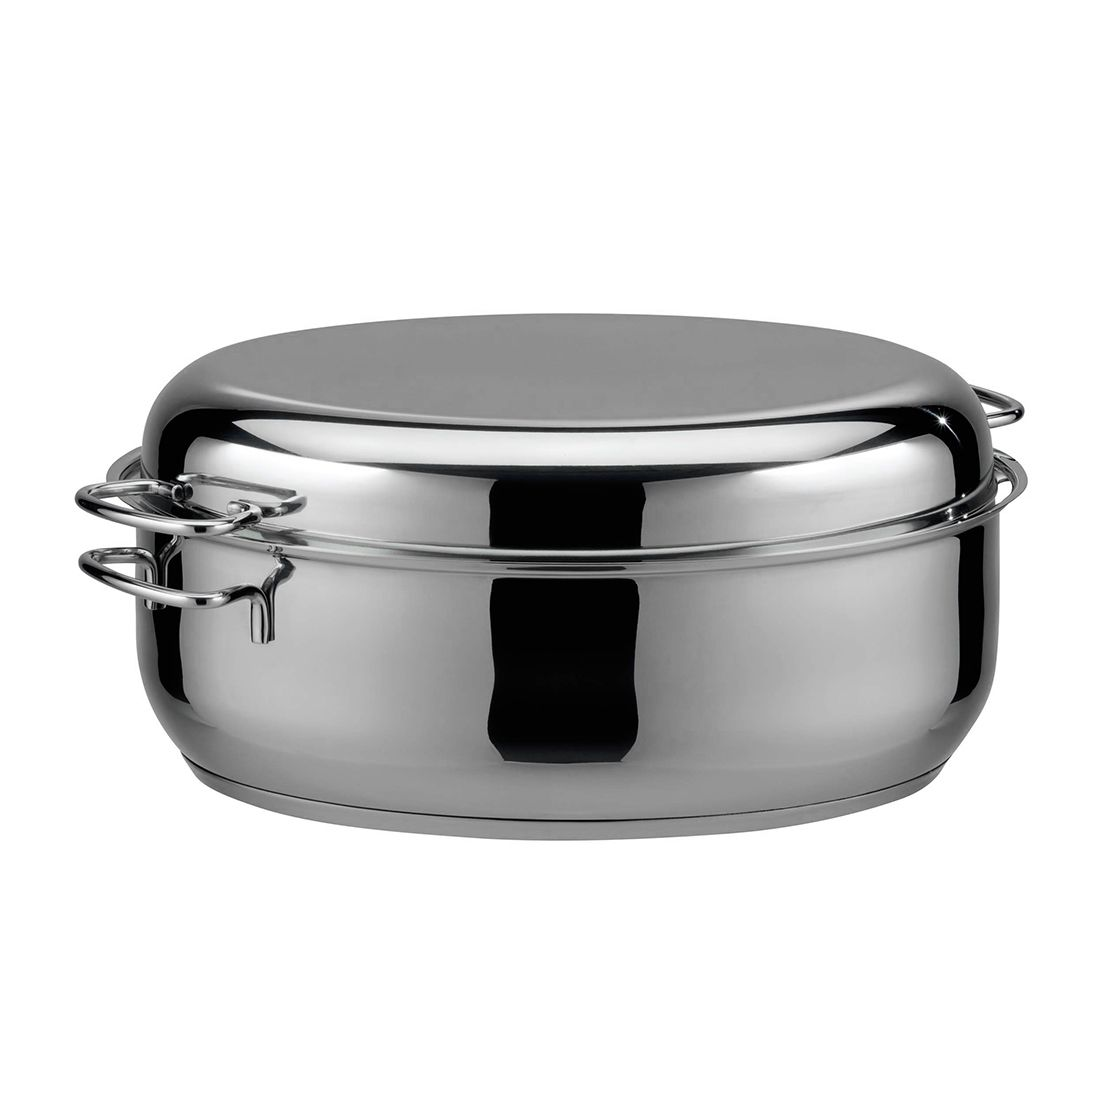 Bräter-Set (3-teilig) – Oval, 38 cm, ELO online kaufen